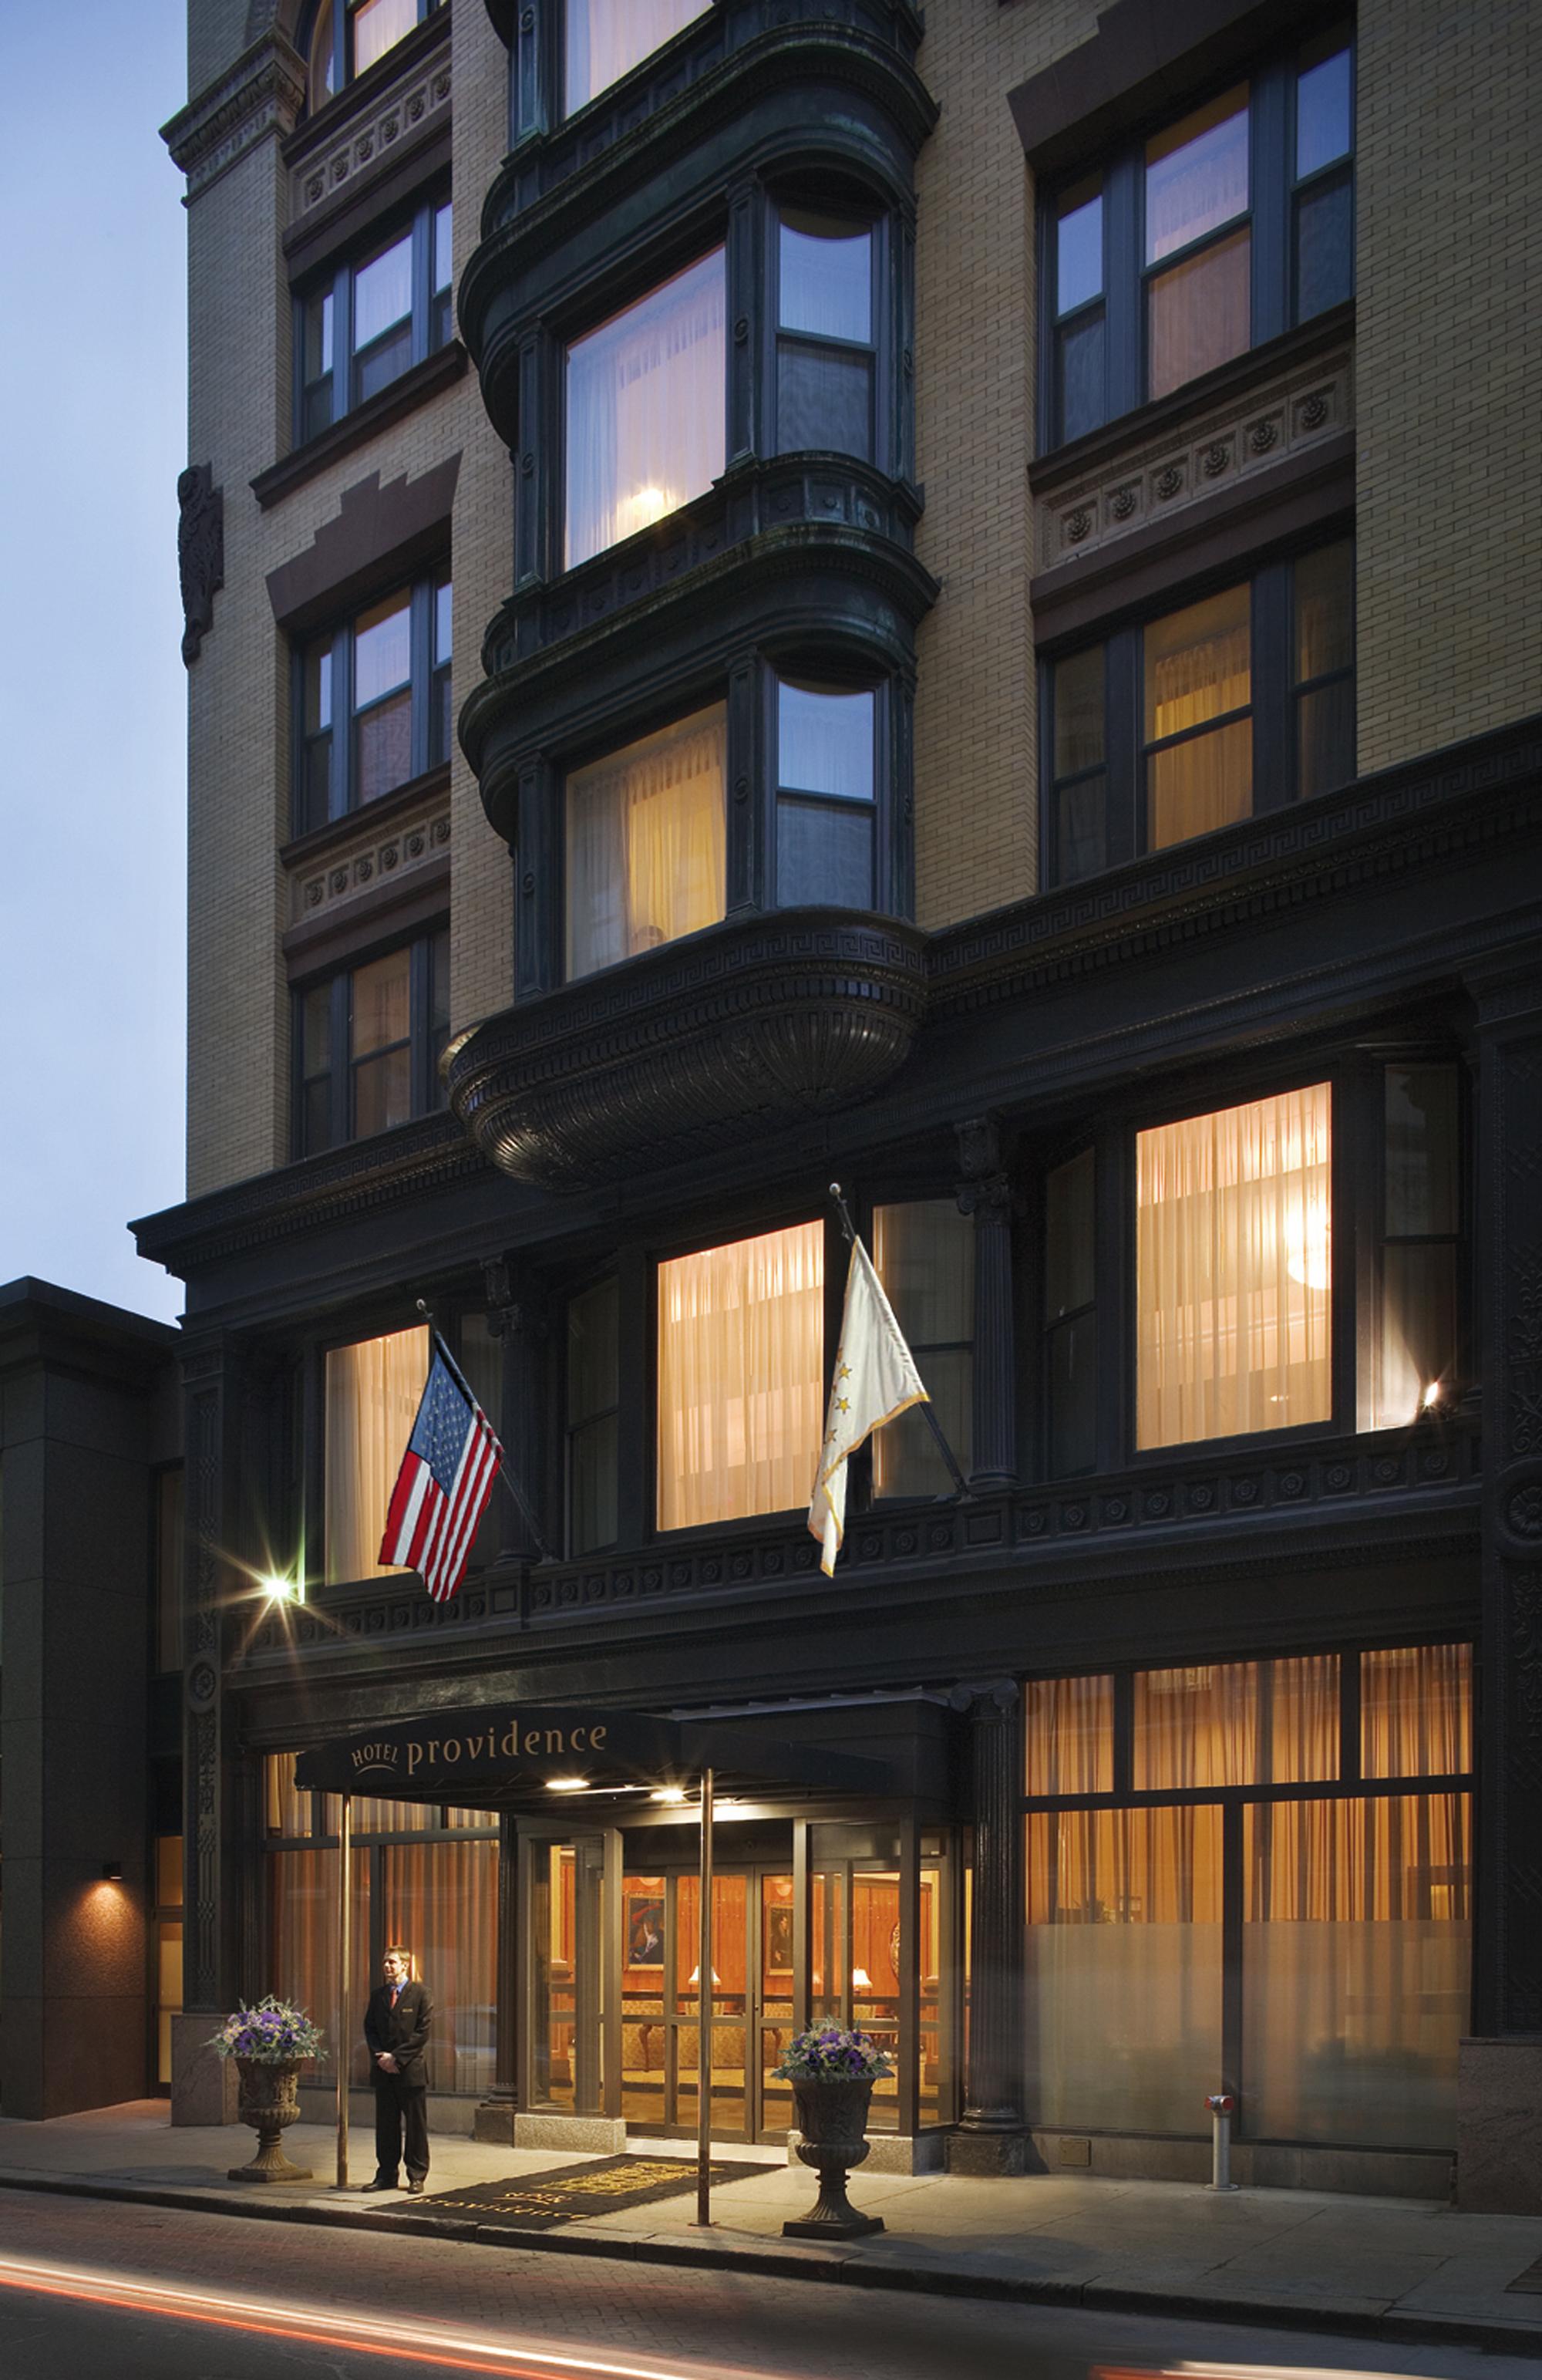 The hotel Providence, Manhattan Digest